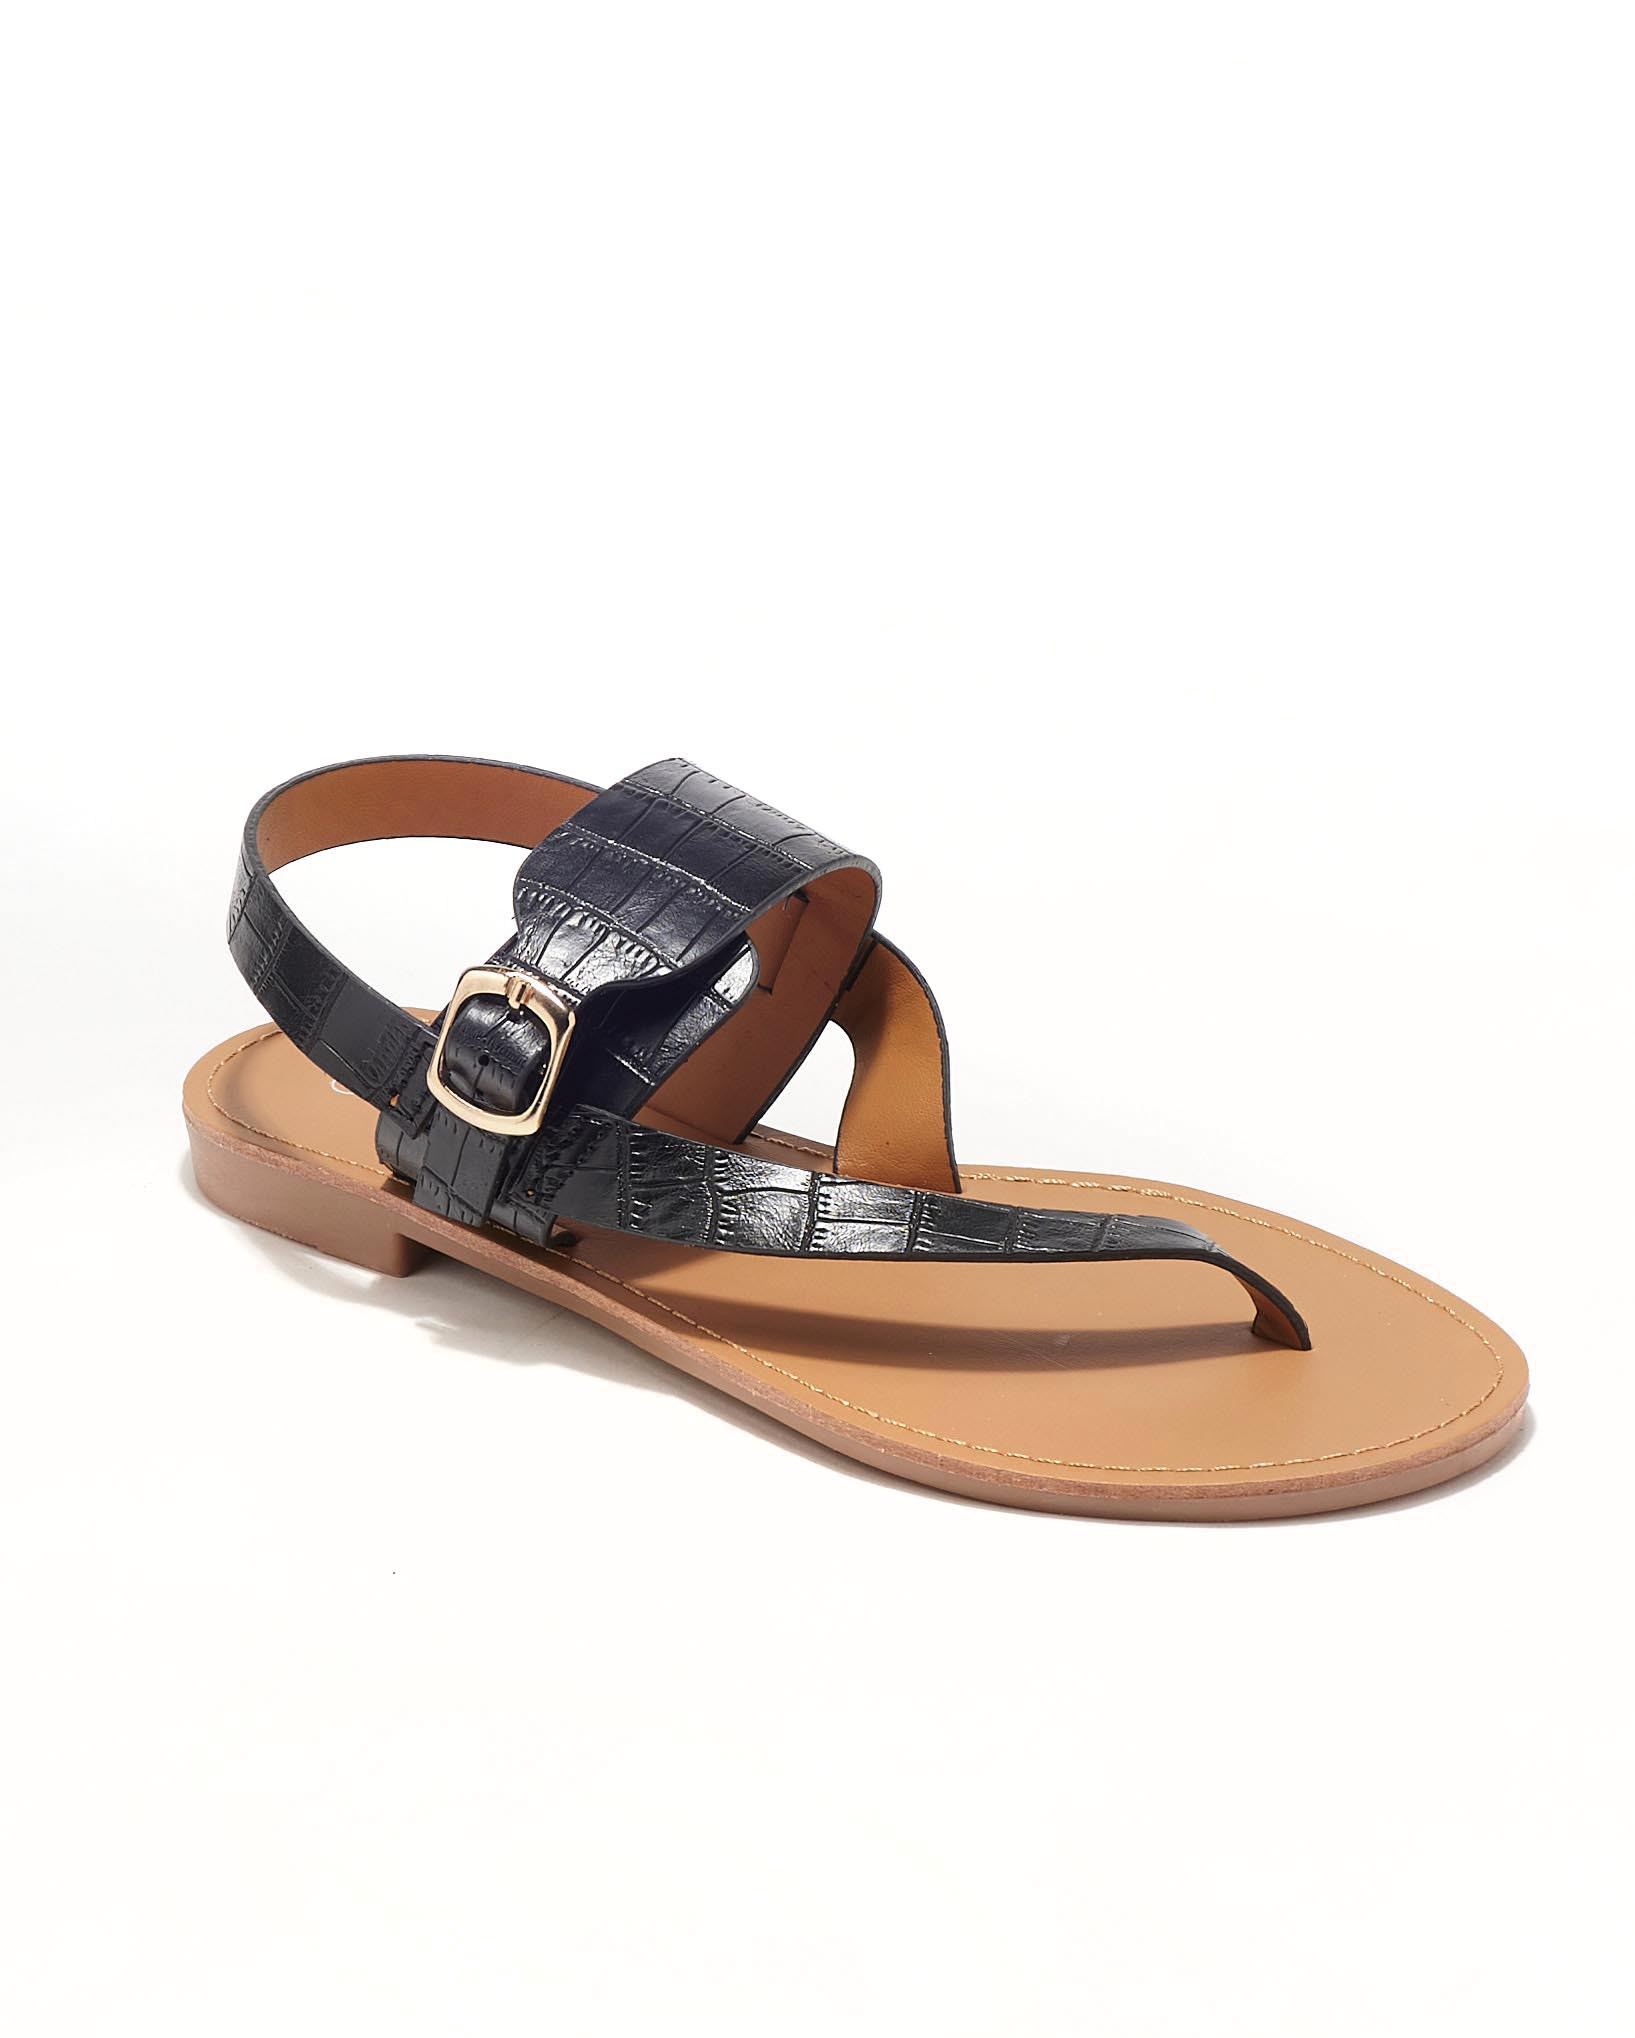 Sandales Plates Femme - Sandale Plate Noir Jina - Hy865